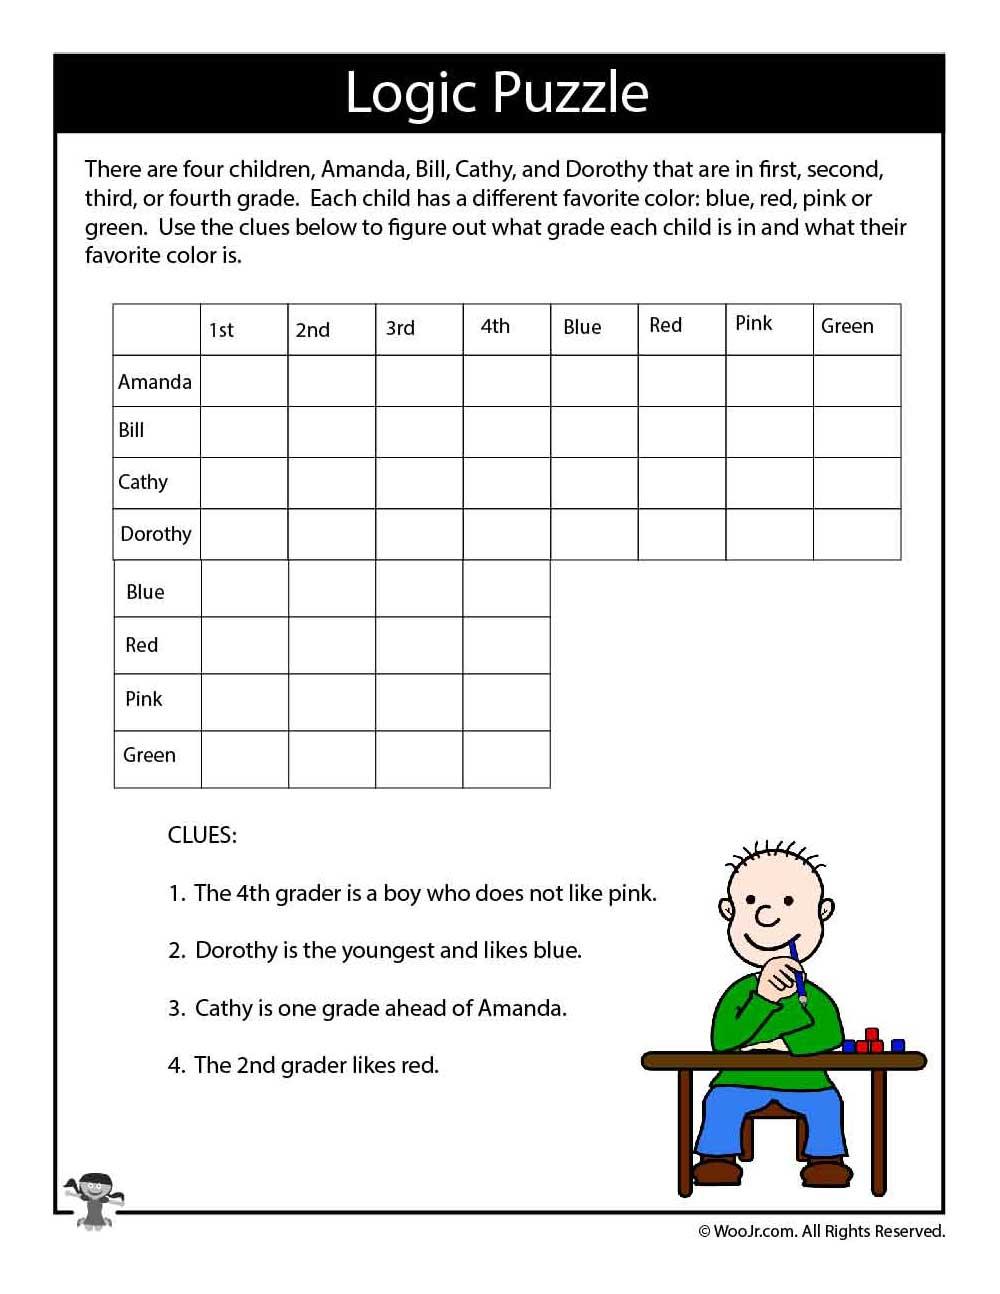 Hard Logic Puzzle For Kids | Woo! Jr. Kids Activities